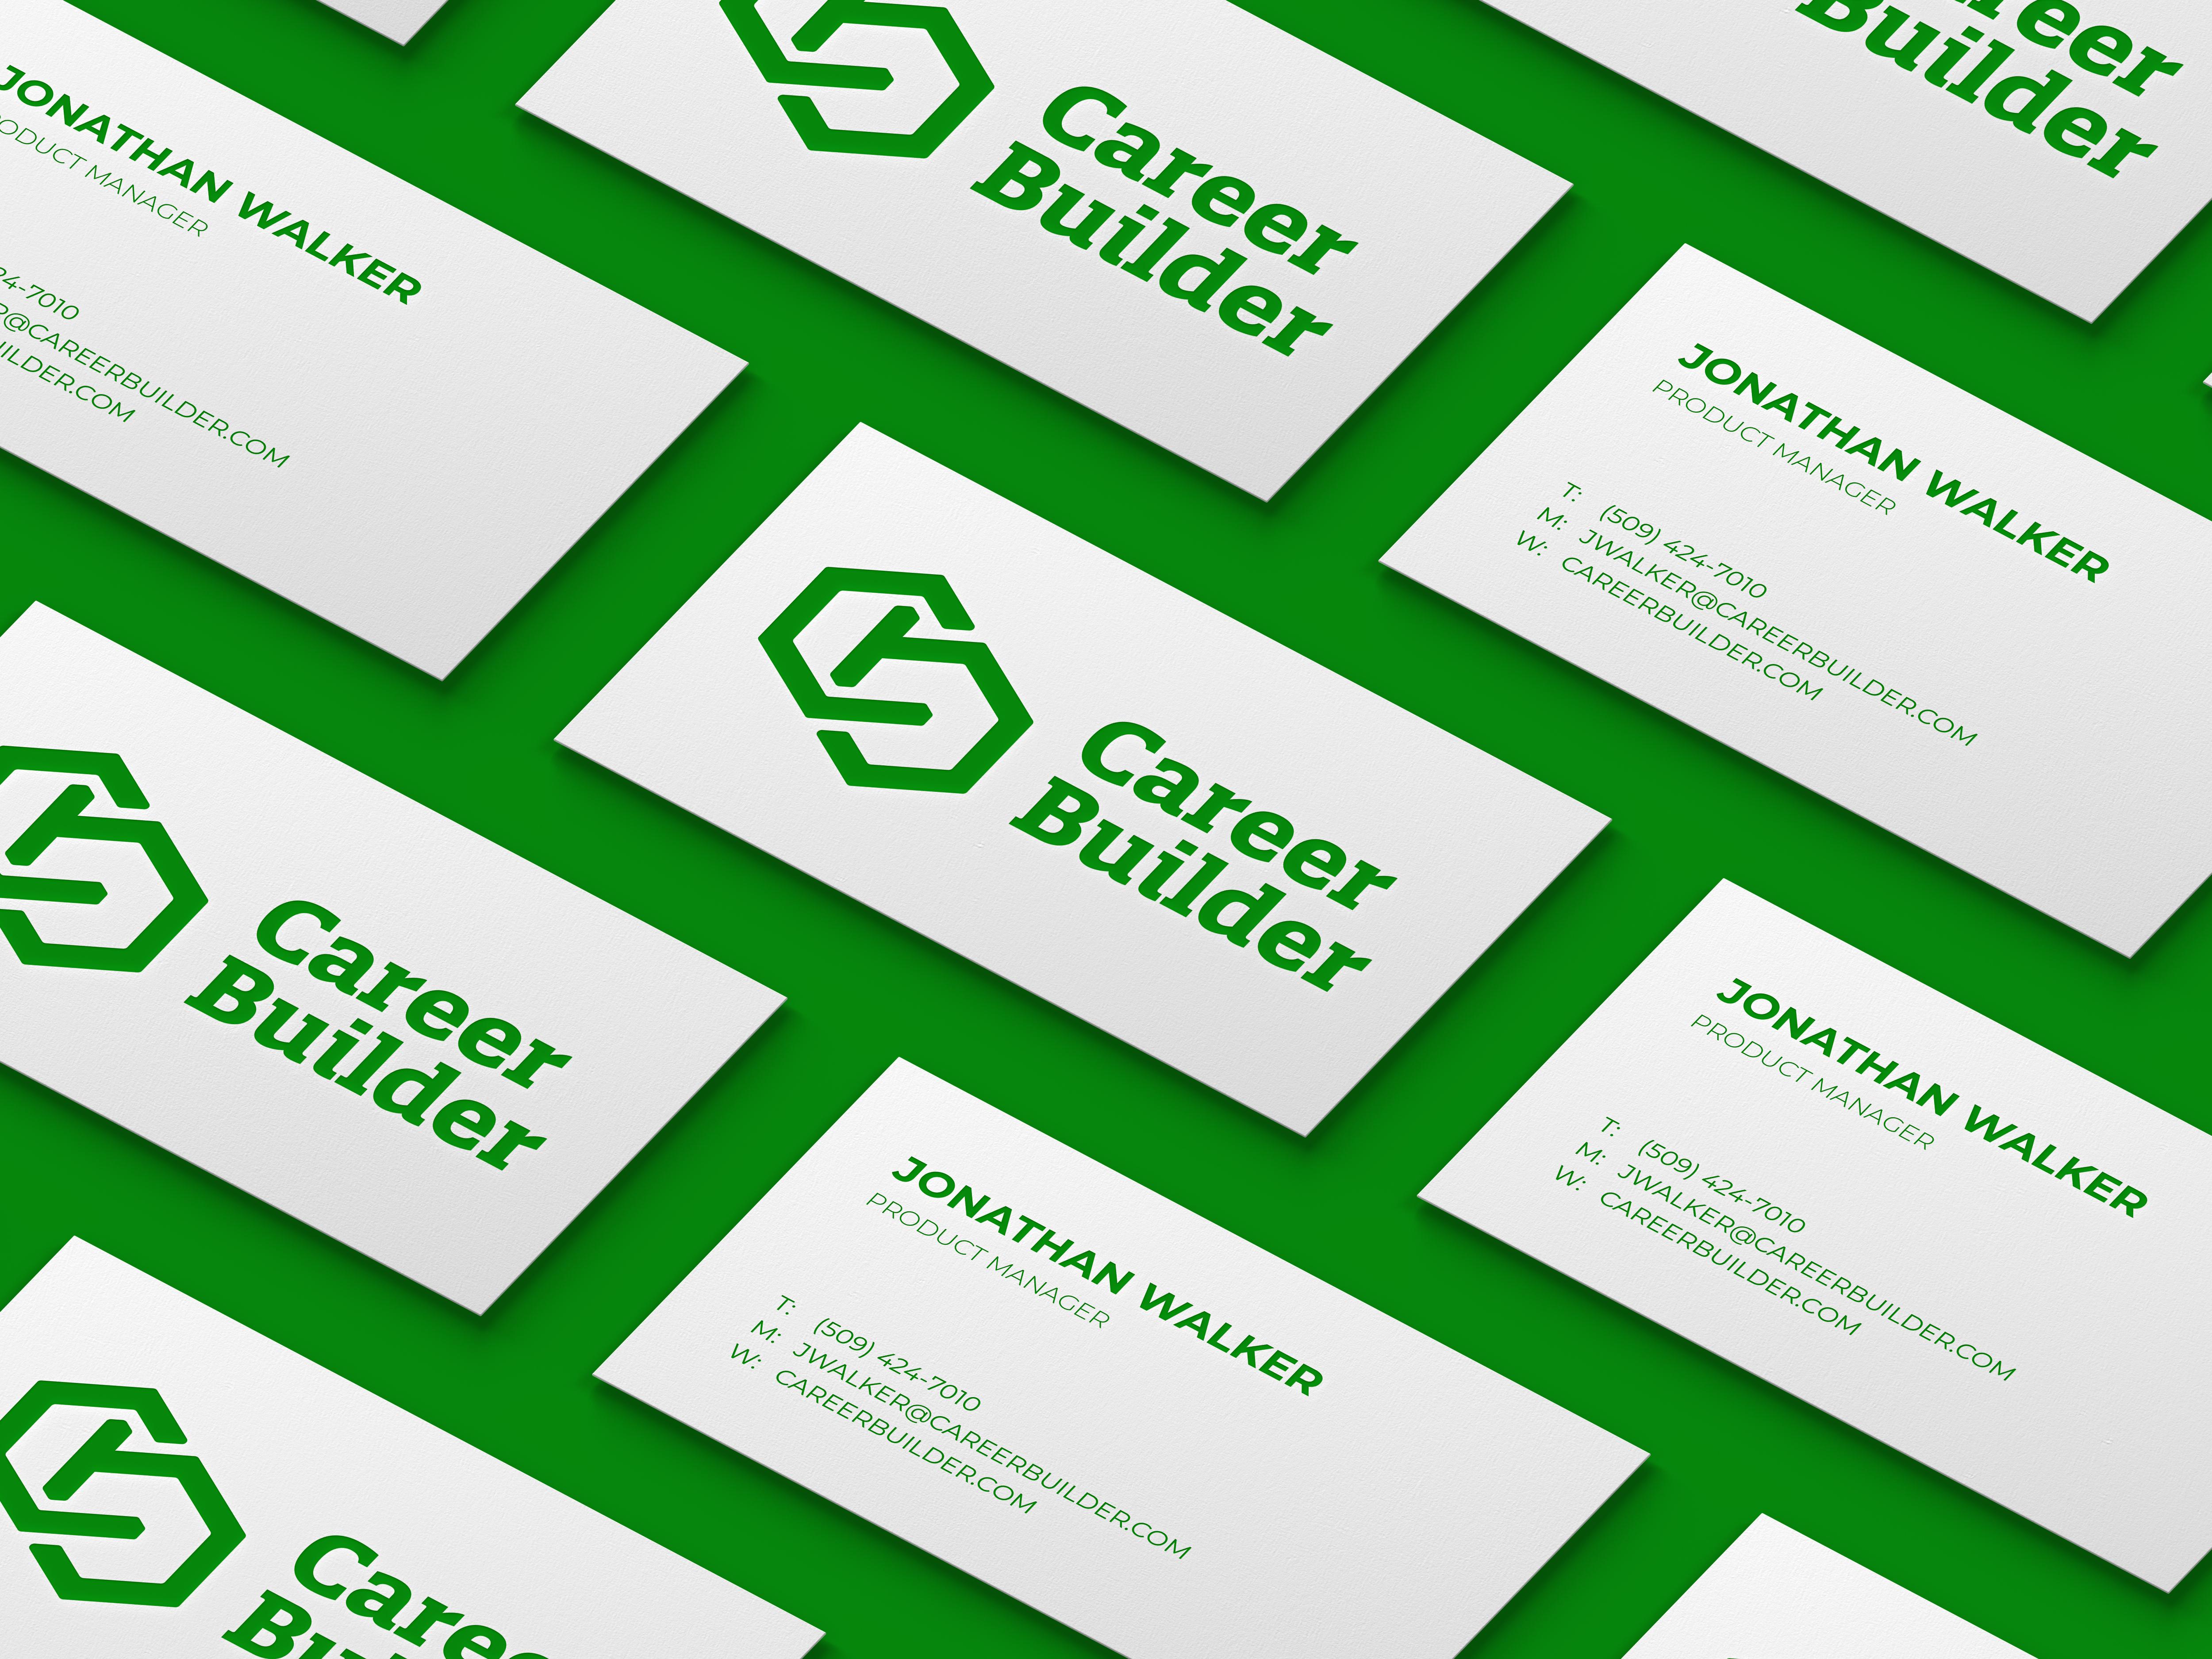 Career Builder Logo Redesign